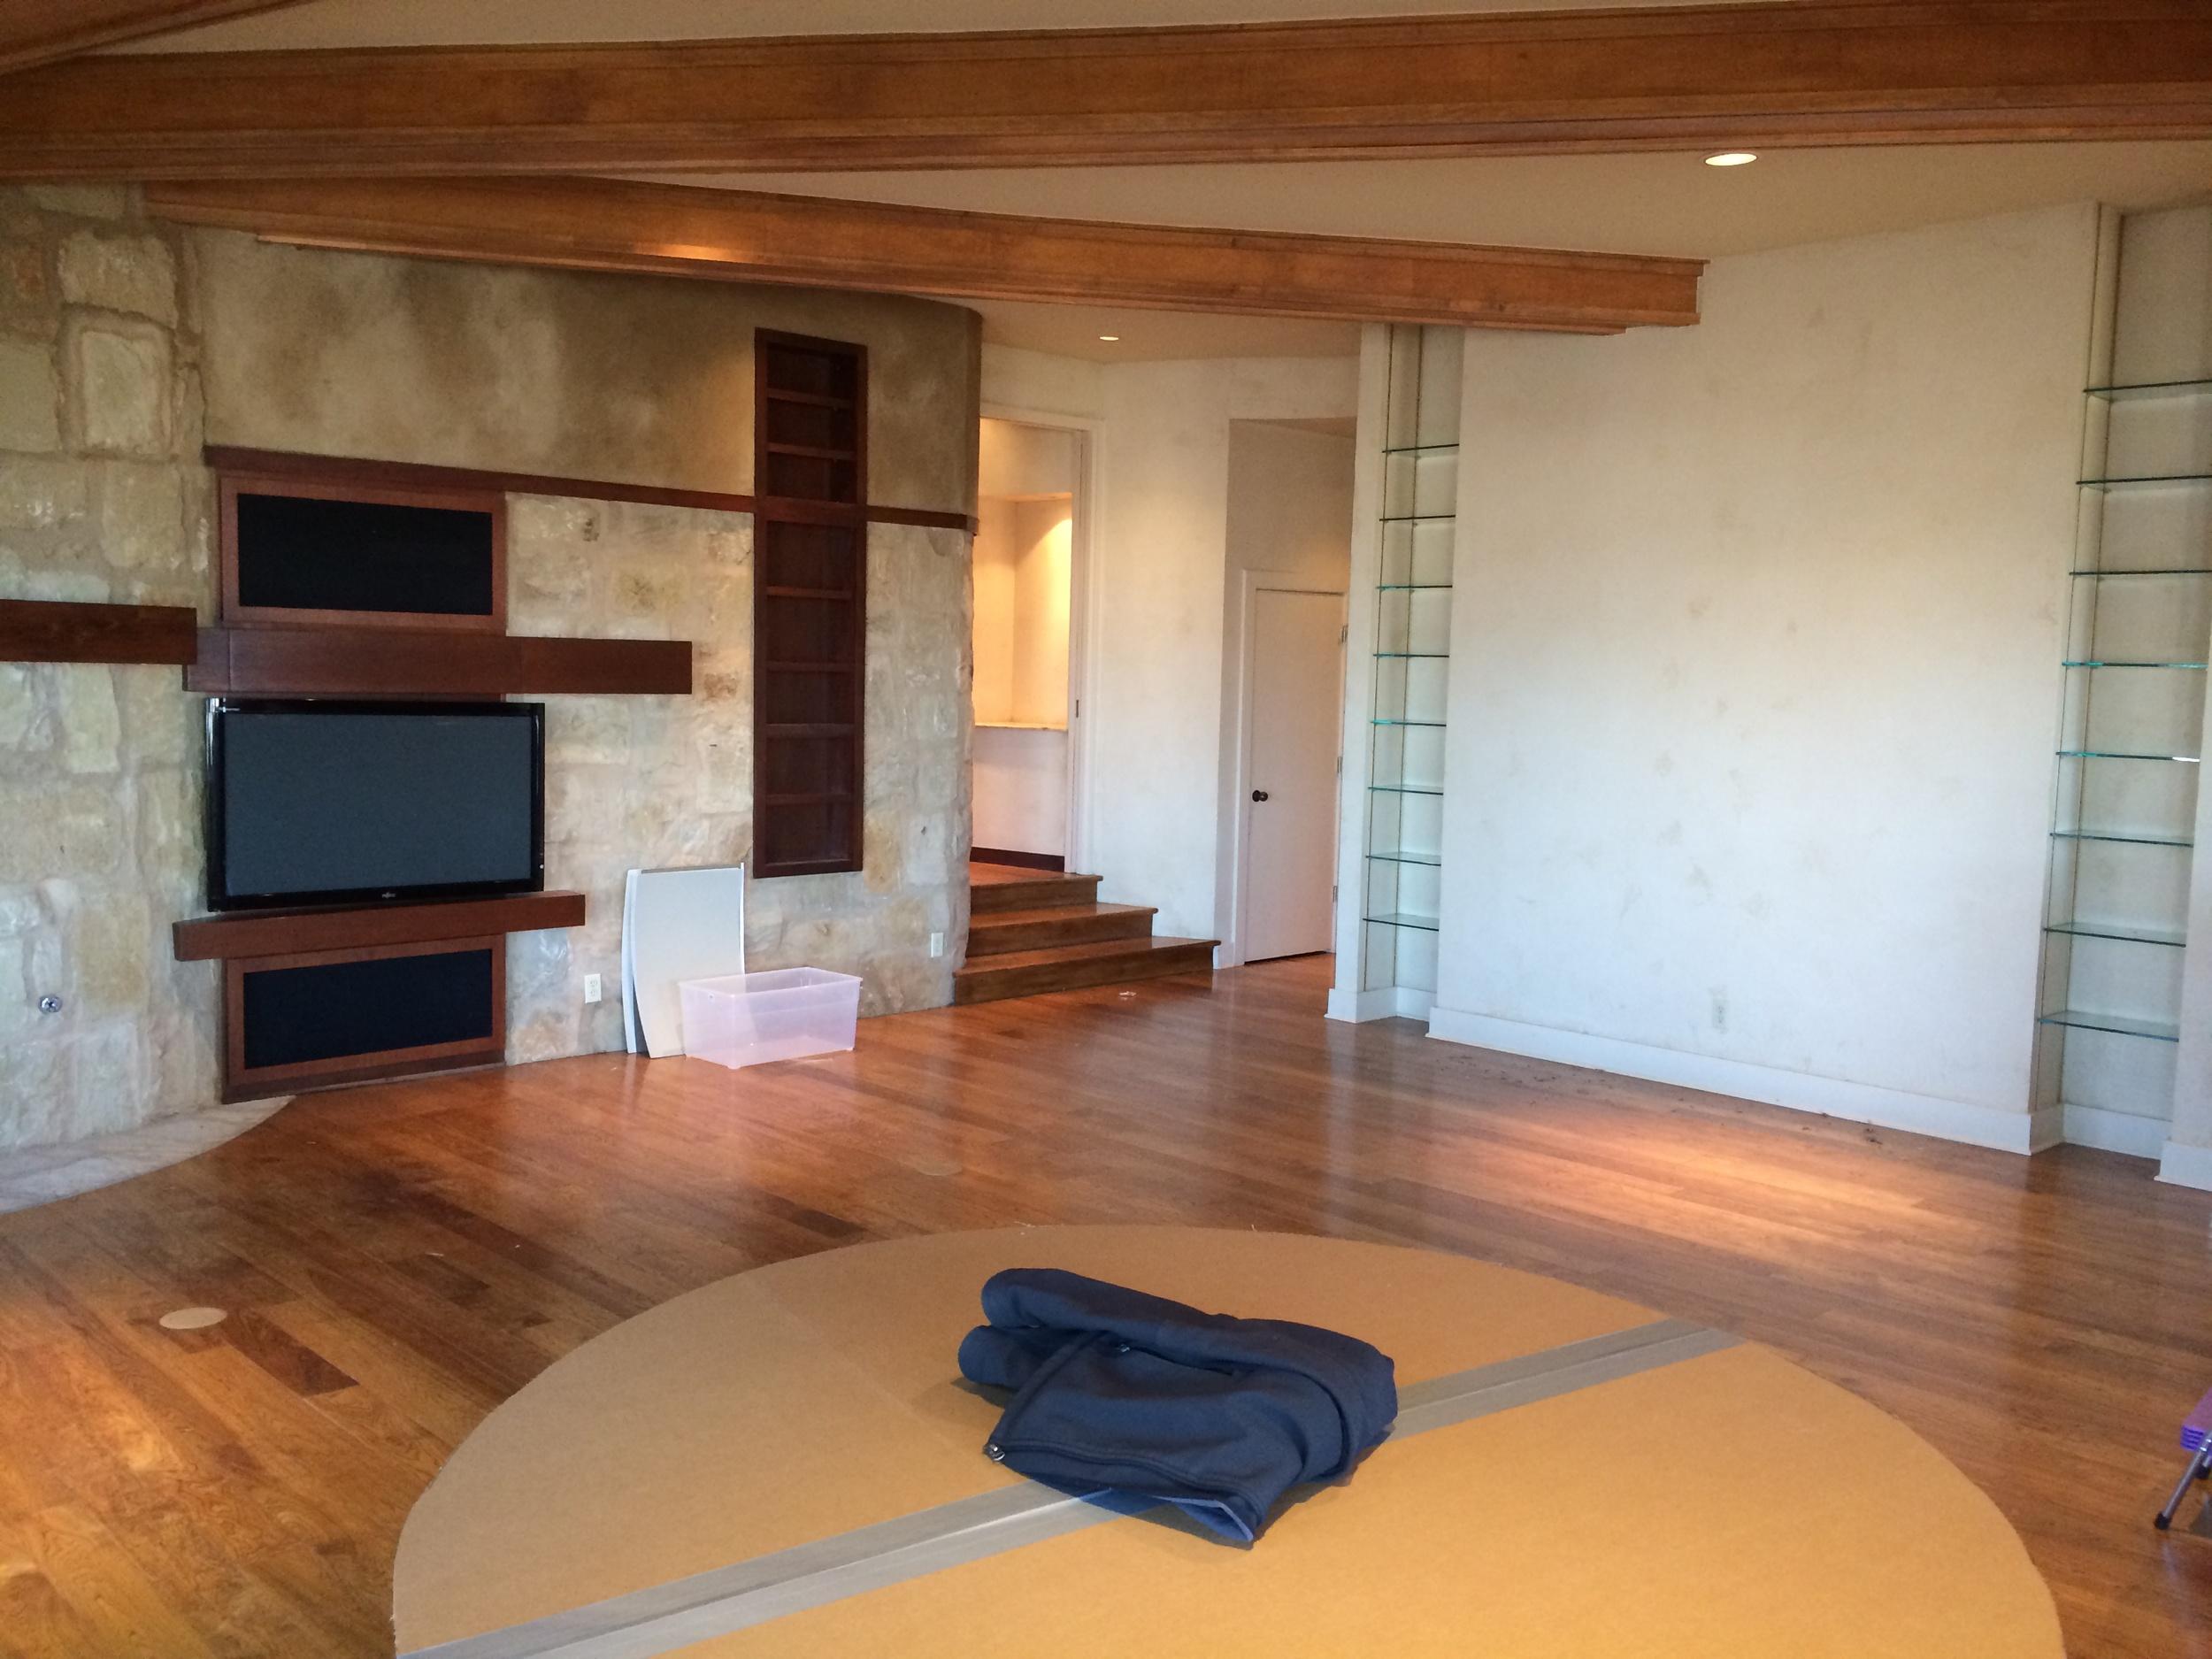 austin_interior_design_renovation012.JPG